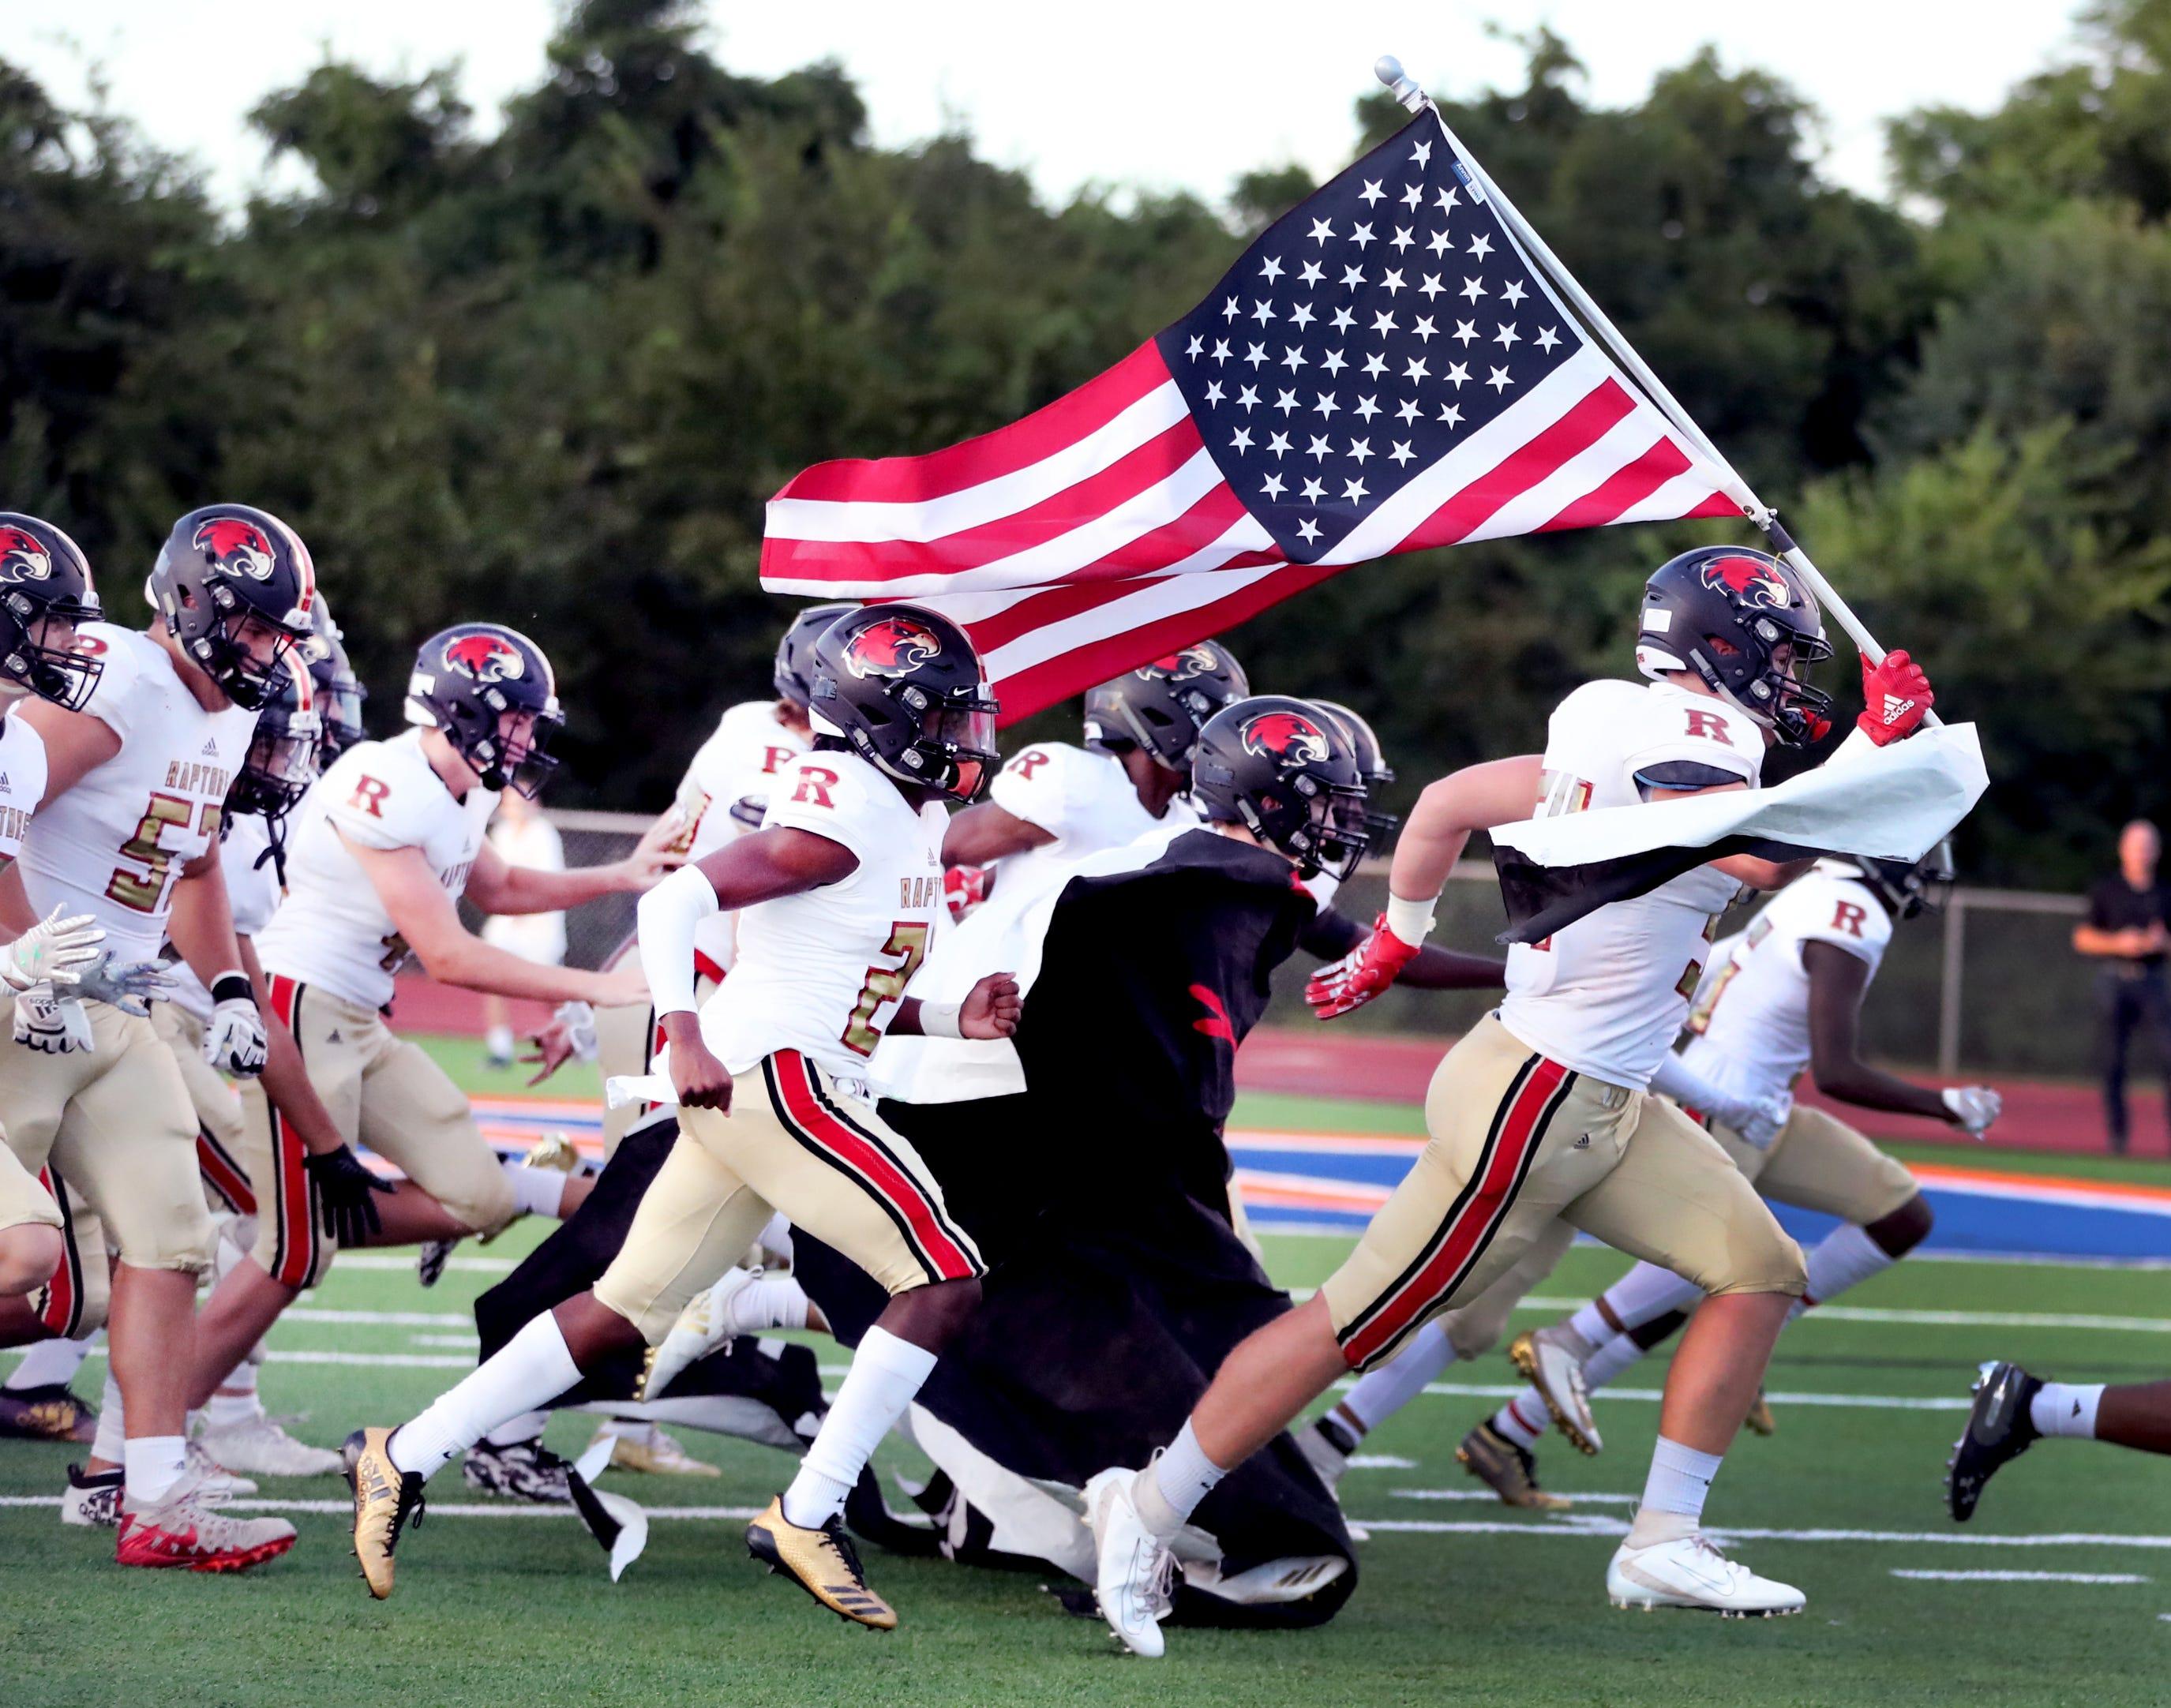 High school football schedule: Top games of Week 4